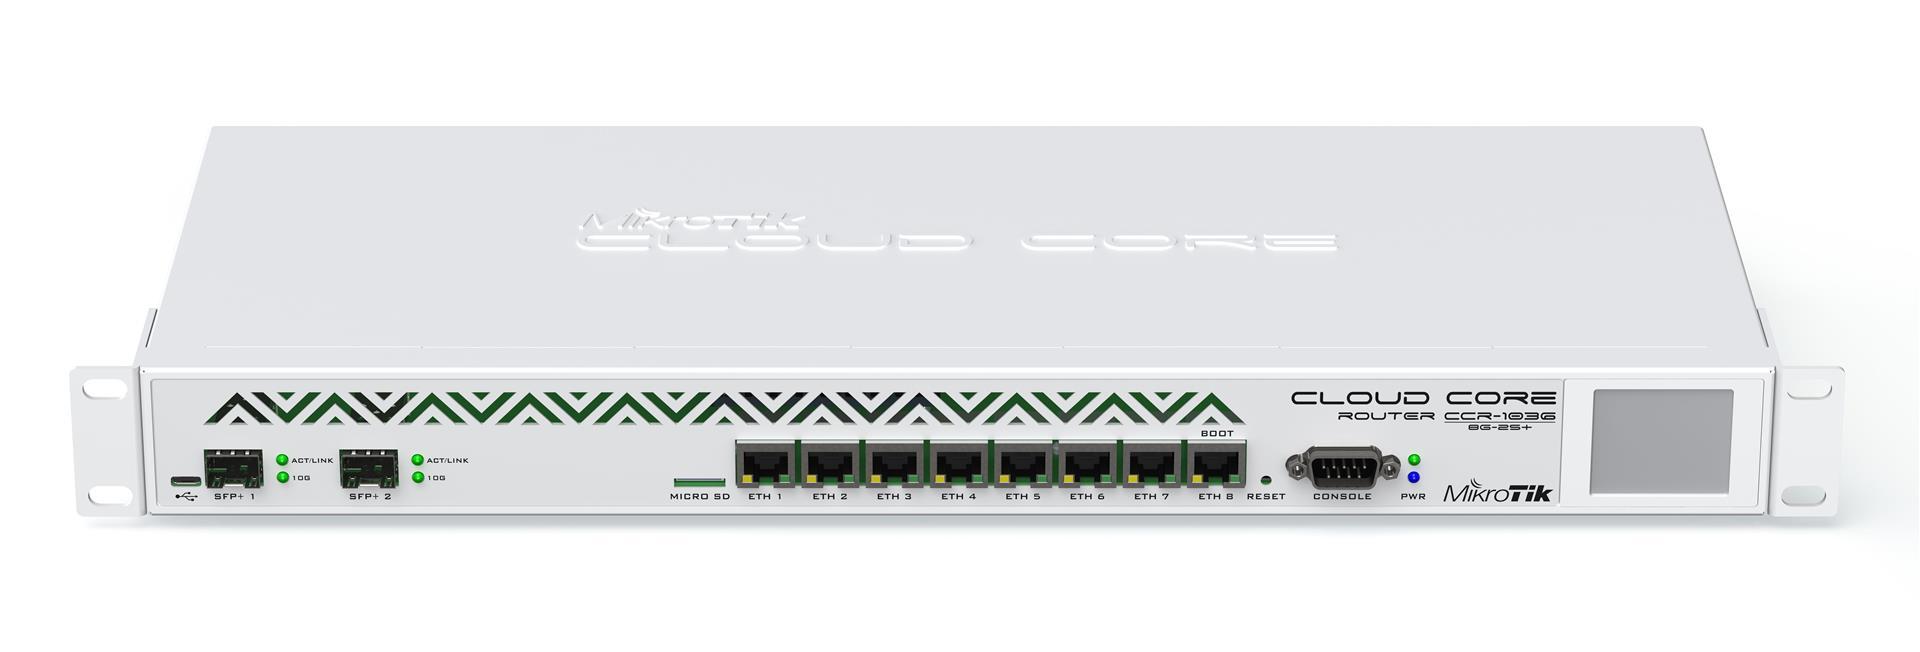 MikroTik Cloud Core Router, CCR1036-8G-2S+, 8x GB LAN,4GB RAM, 2xSFP+ cage, Level6, RM 1U, PSU, LCD